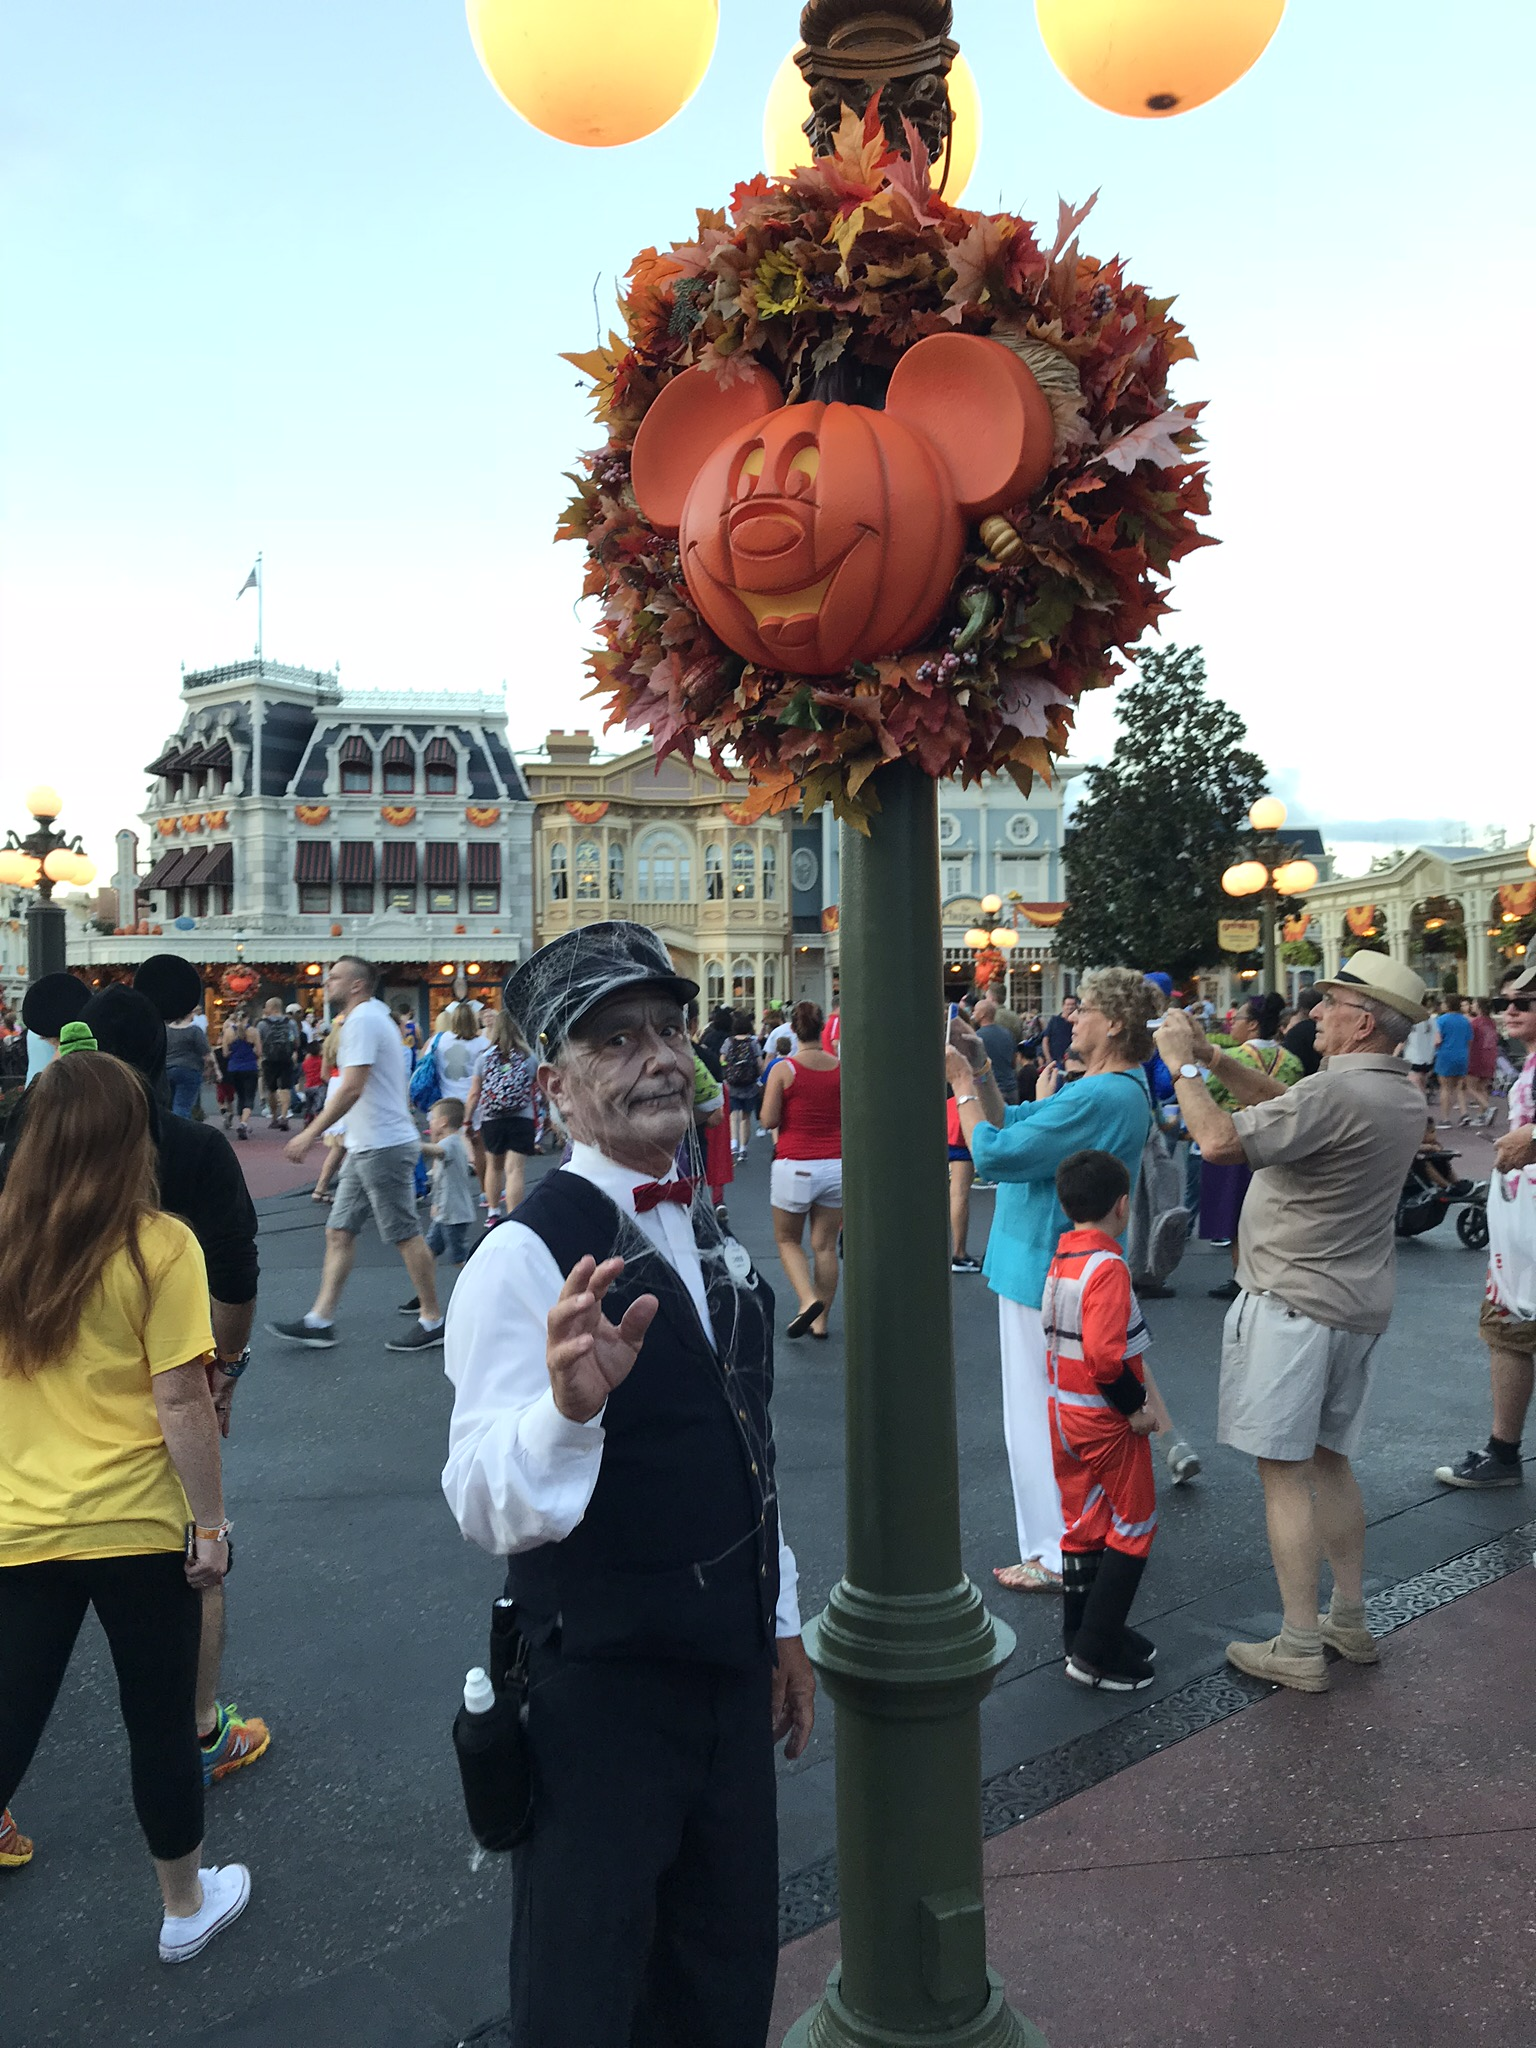 halloween-at-disney-character.jpg